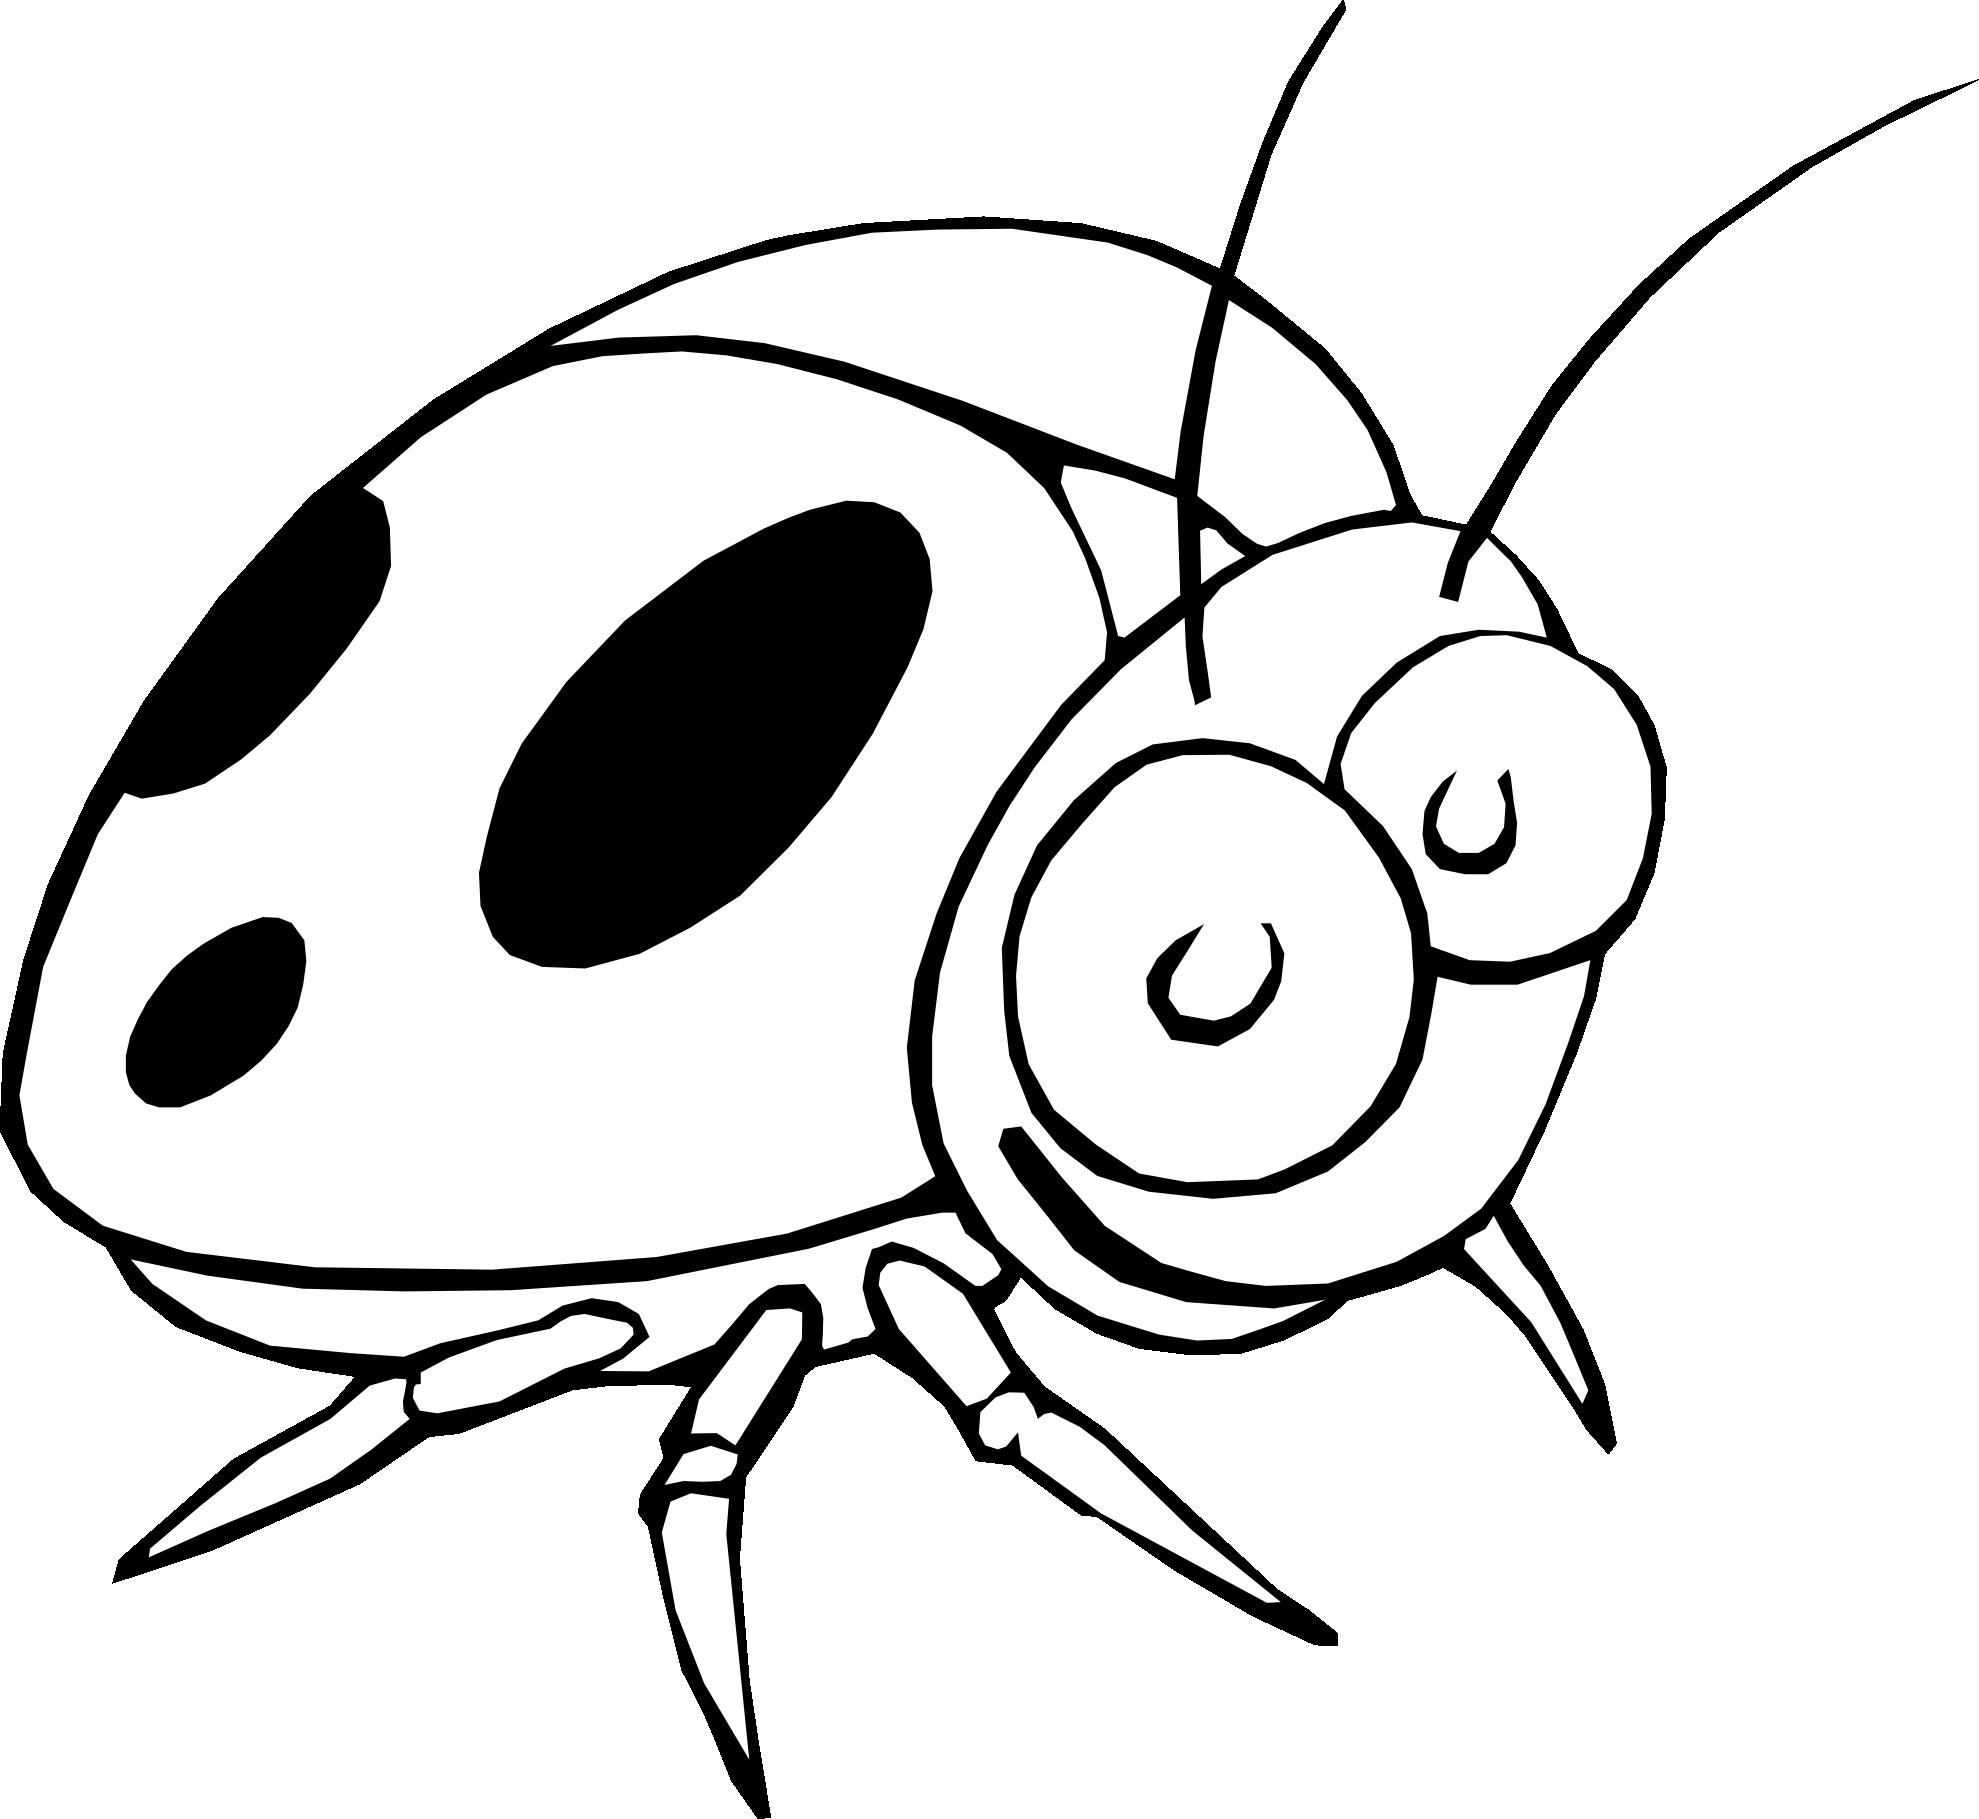 Bugs black and white. Ladybugs clipart free baby